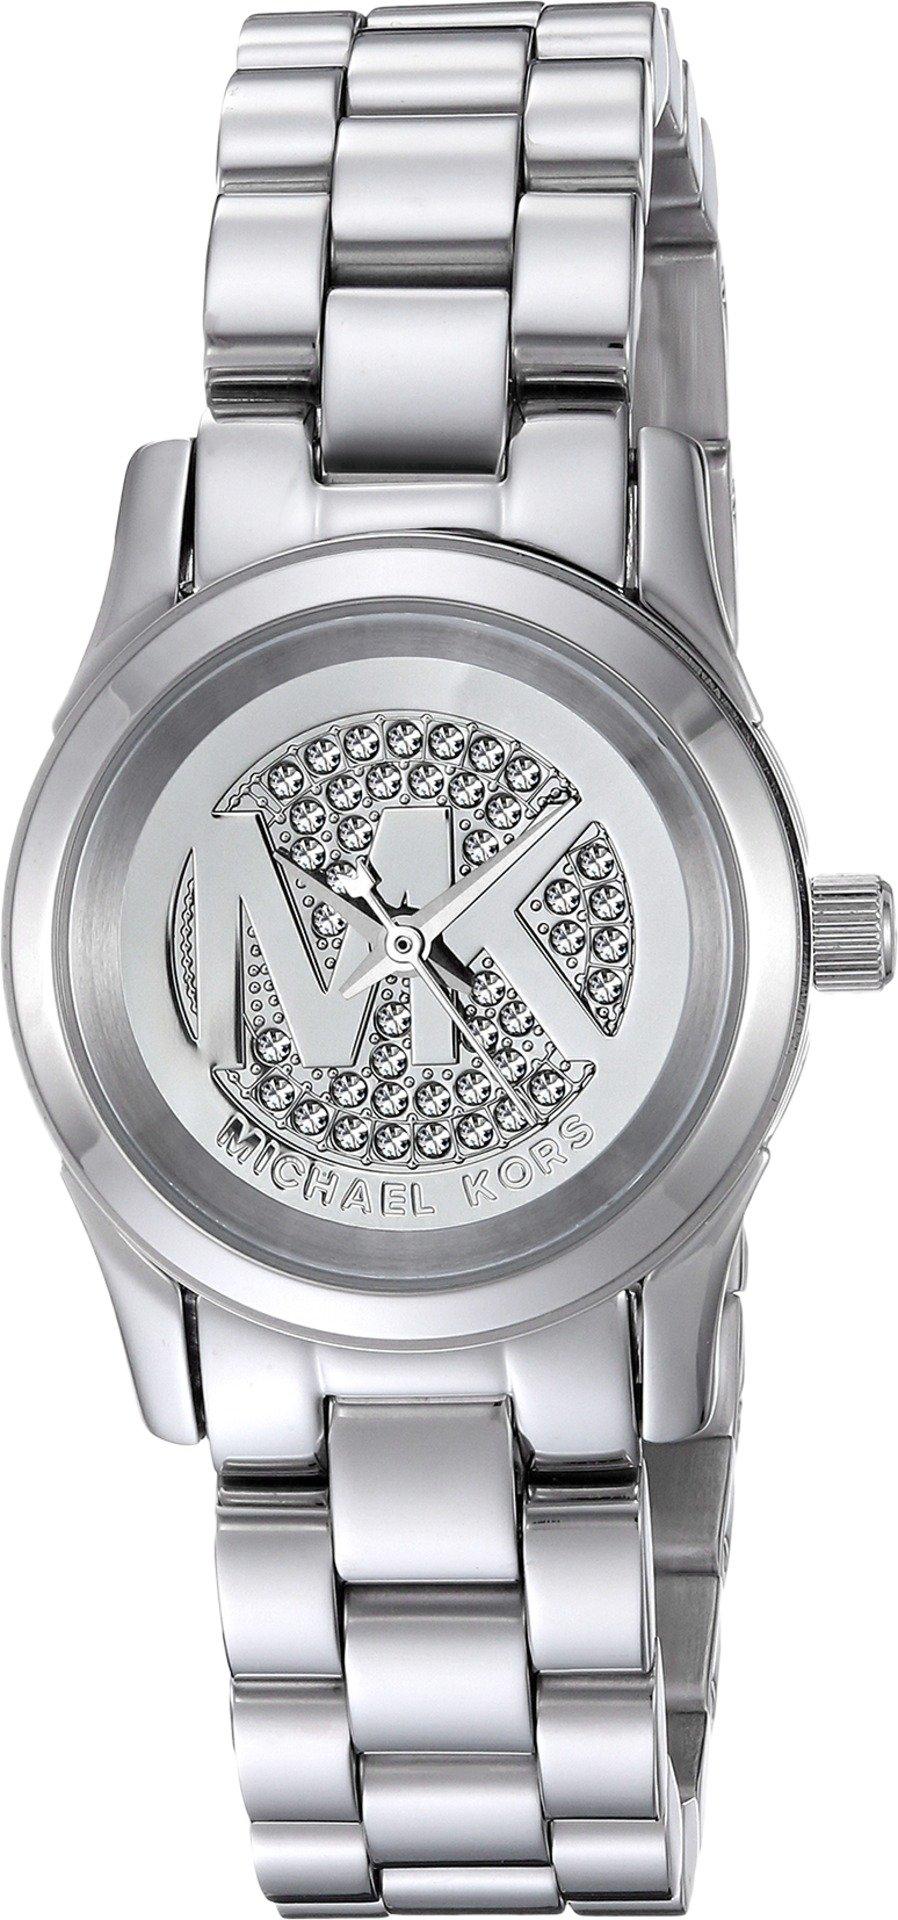 Michael Kors Women's MK3303 Silver One Size